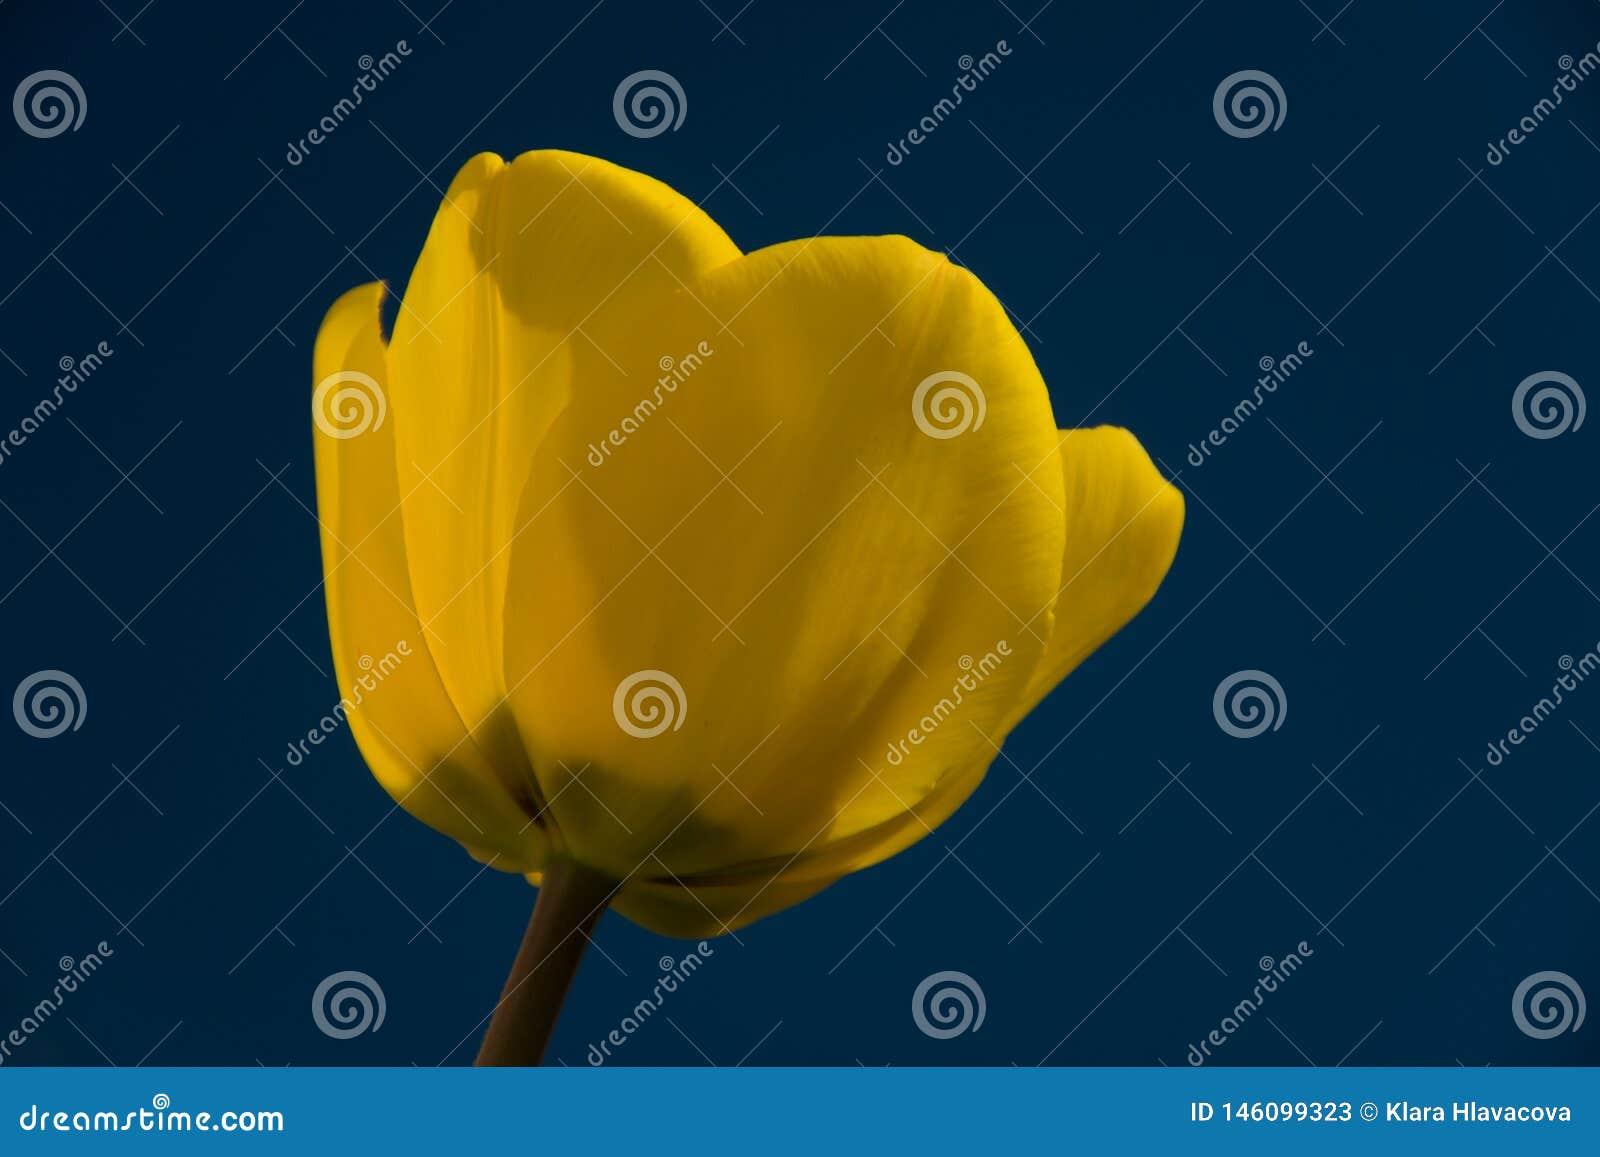 Yellow tulip flower on blue background